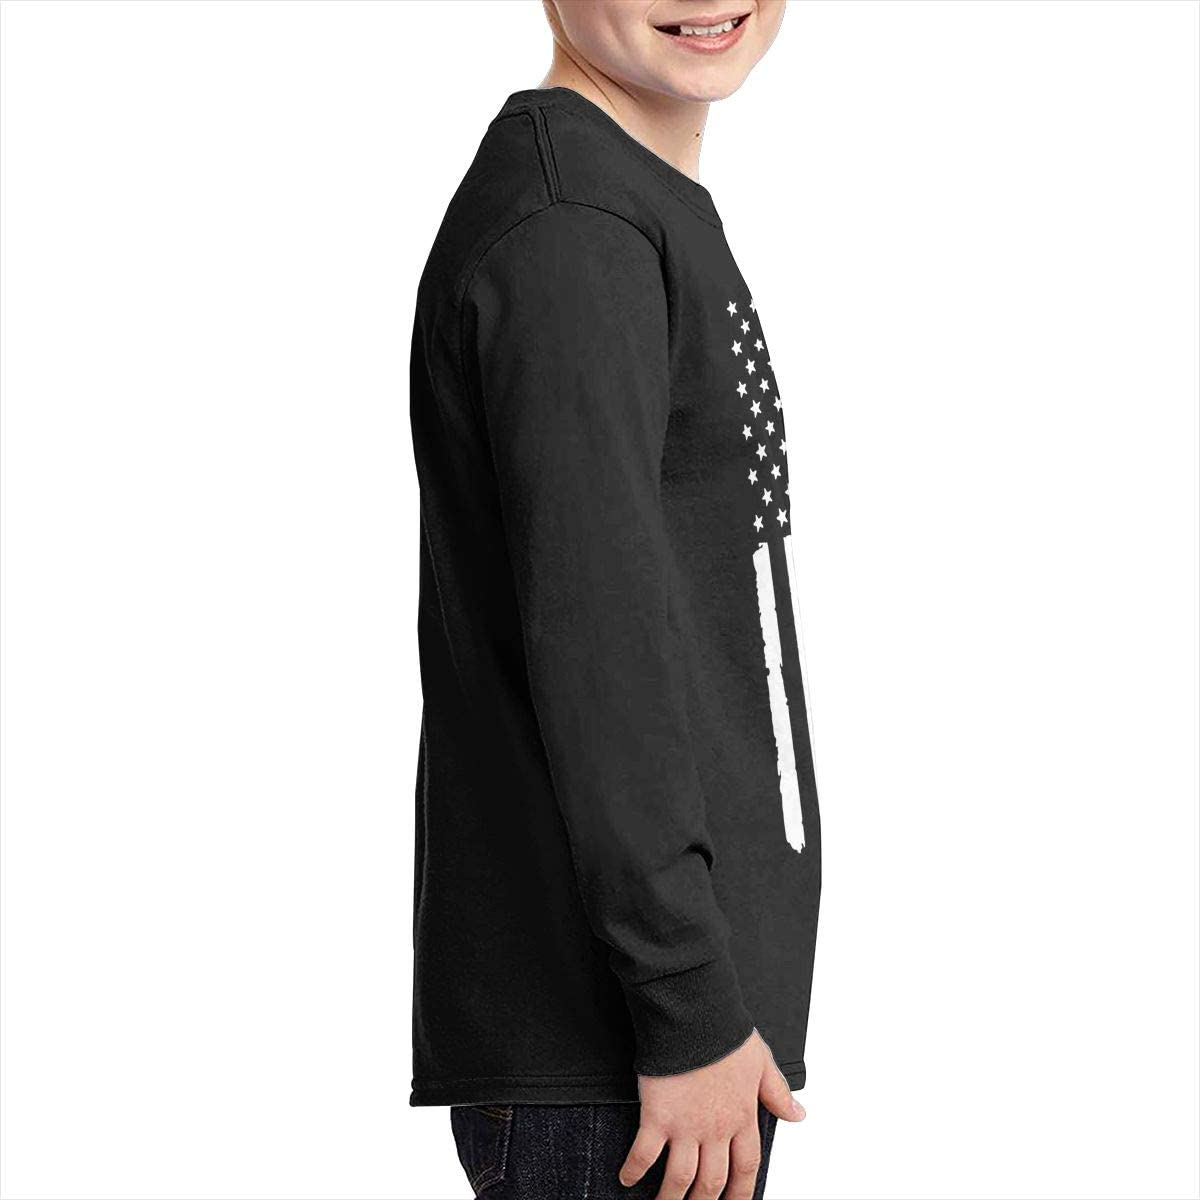 Teenagers Teen Girl Epilepsy Cancer Awareness Flag-1 Printed Long Sleeve 100/% Cotton Tops